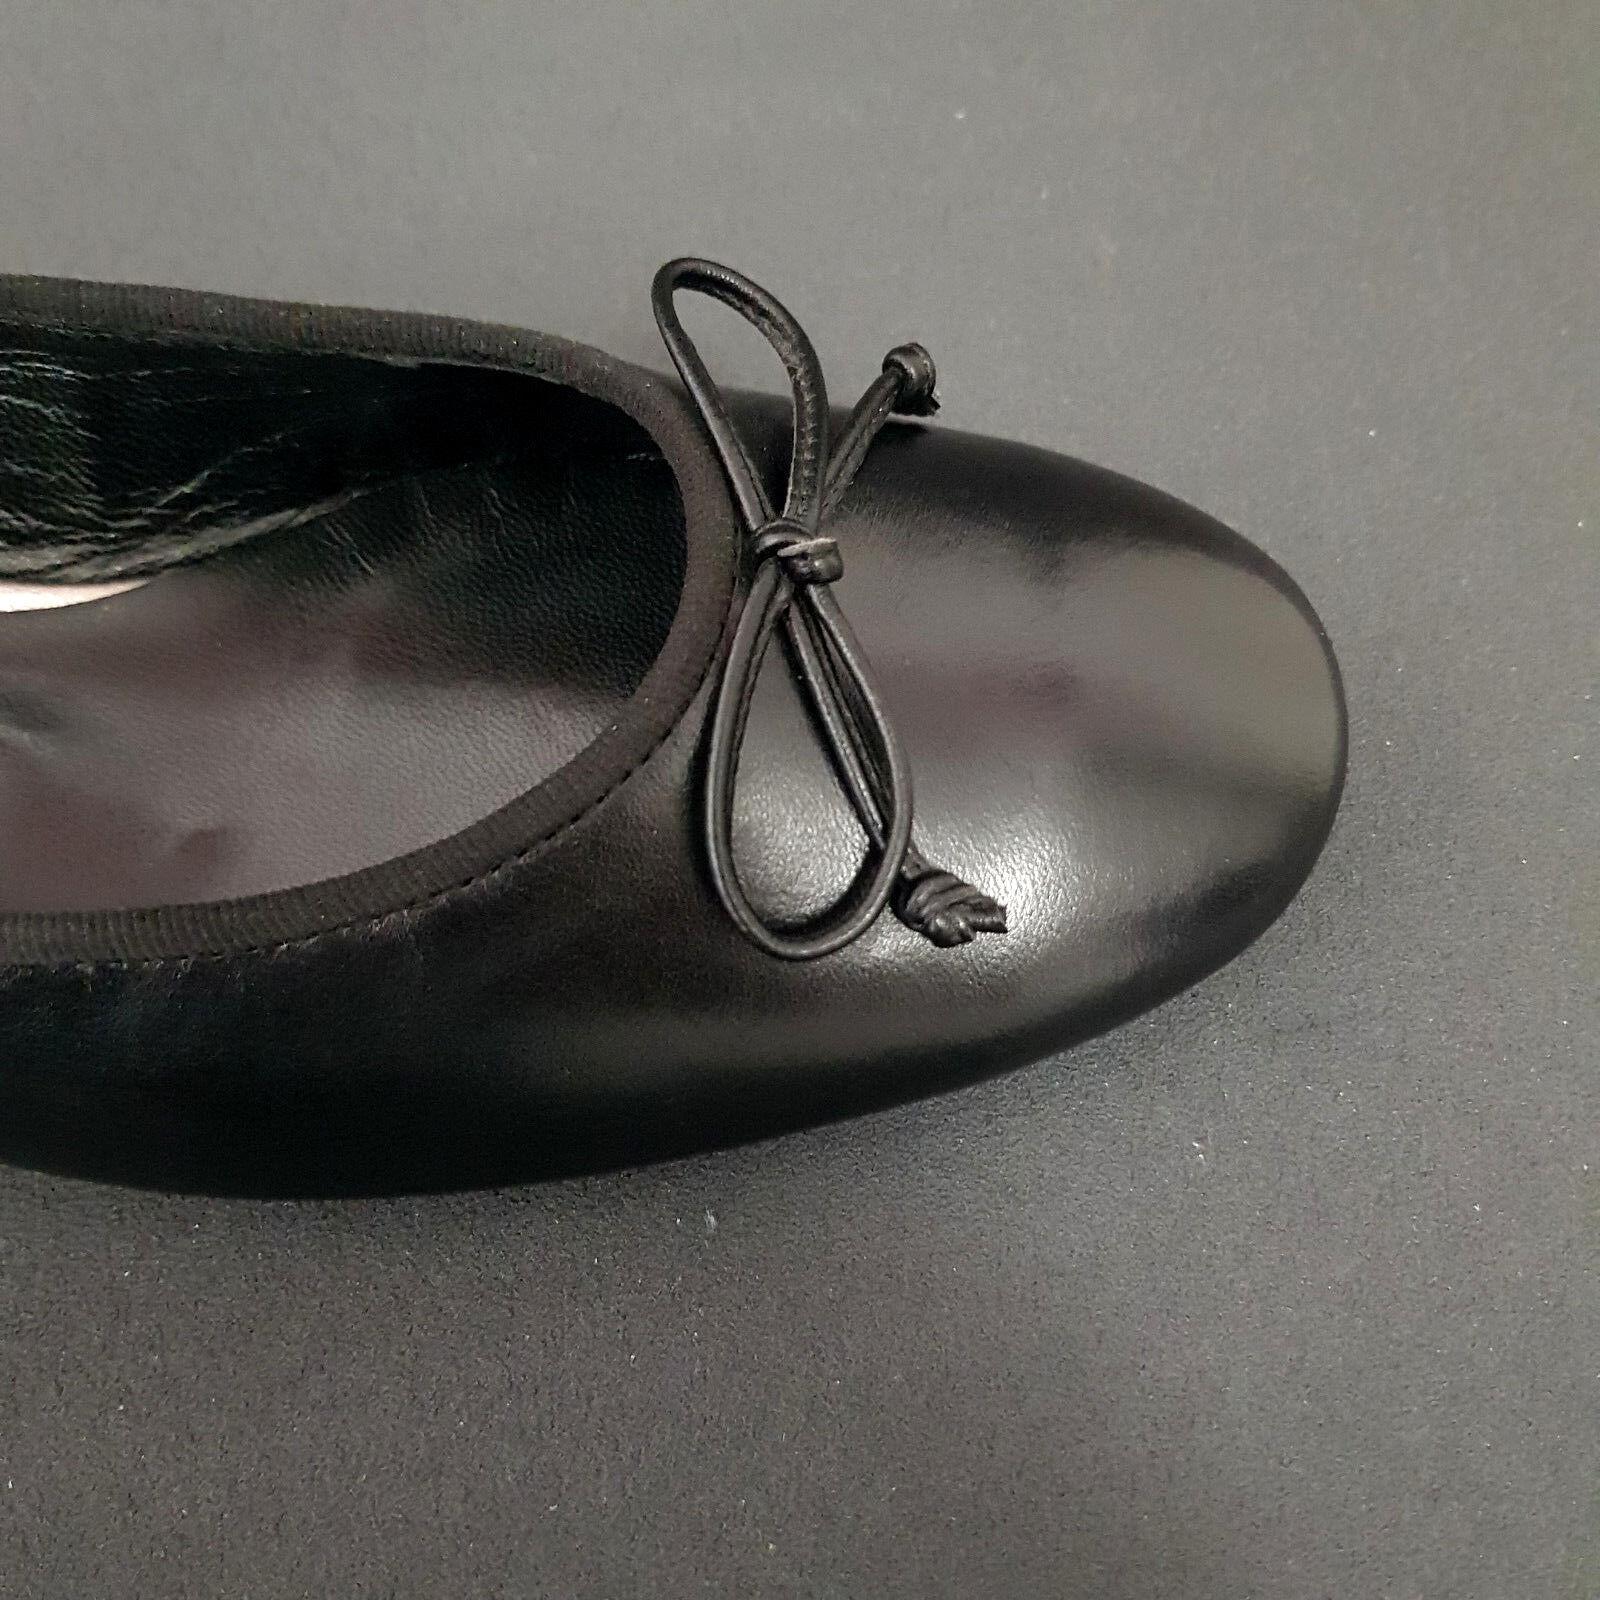 Paul Grün Damen Ballerinas NEU 3102 111 schwarz Leder mit Schleife NEU Ballerinas b030ae